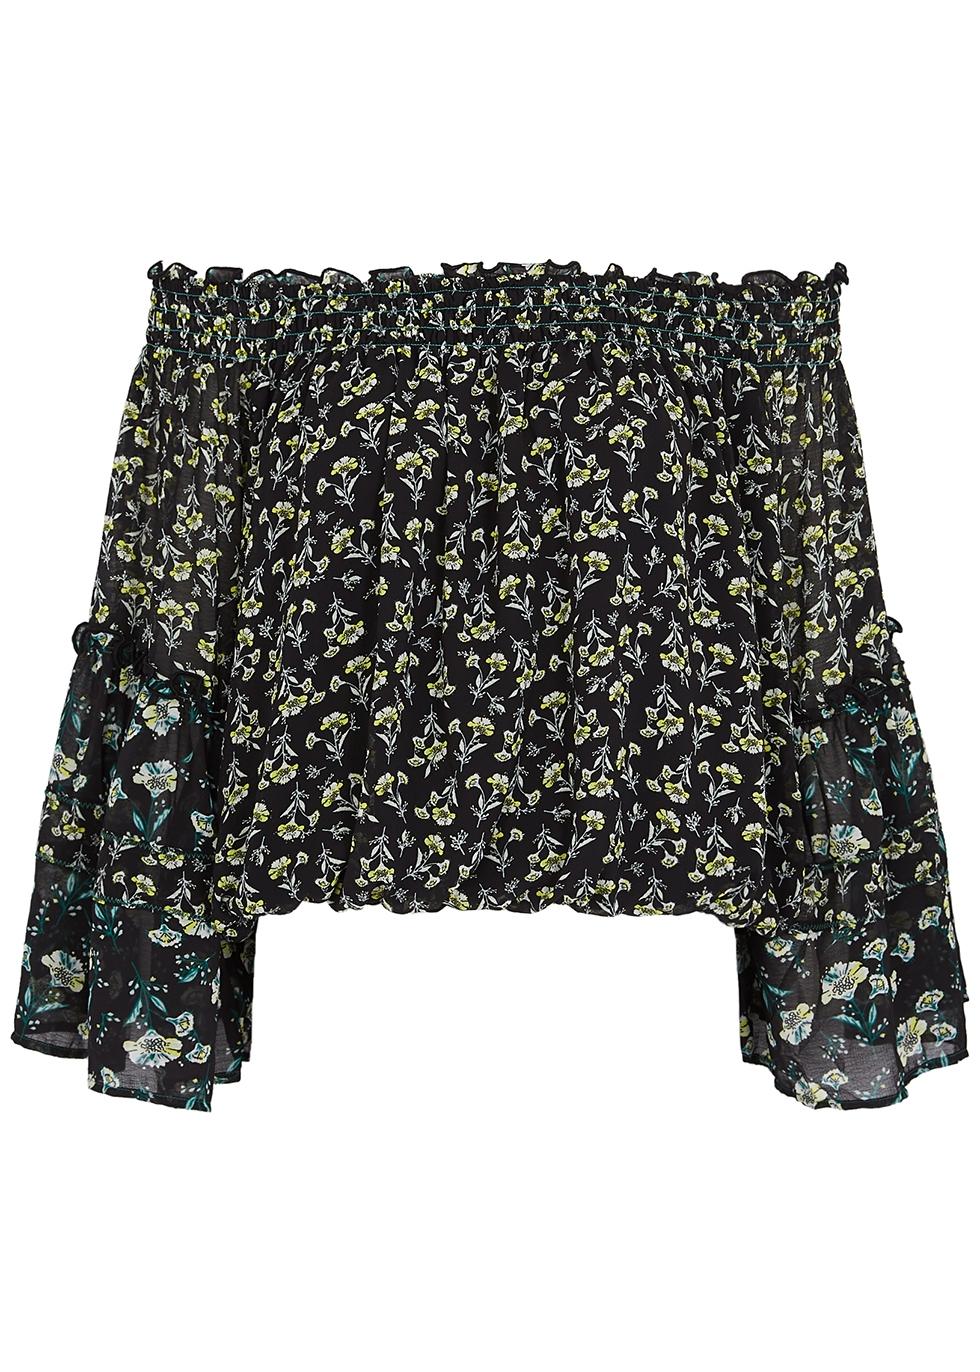 Black floral-print chiffon top